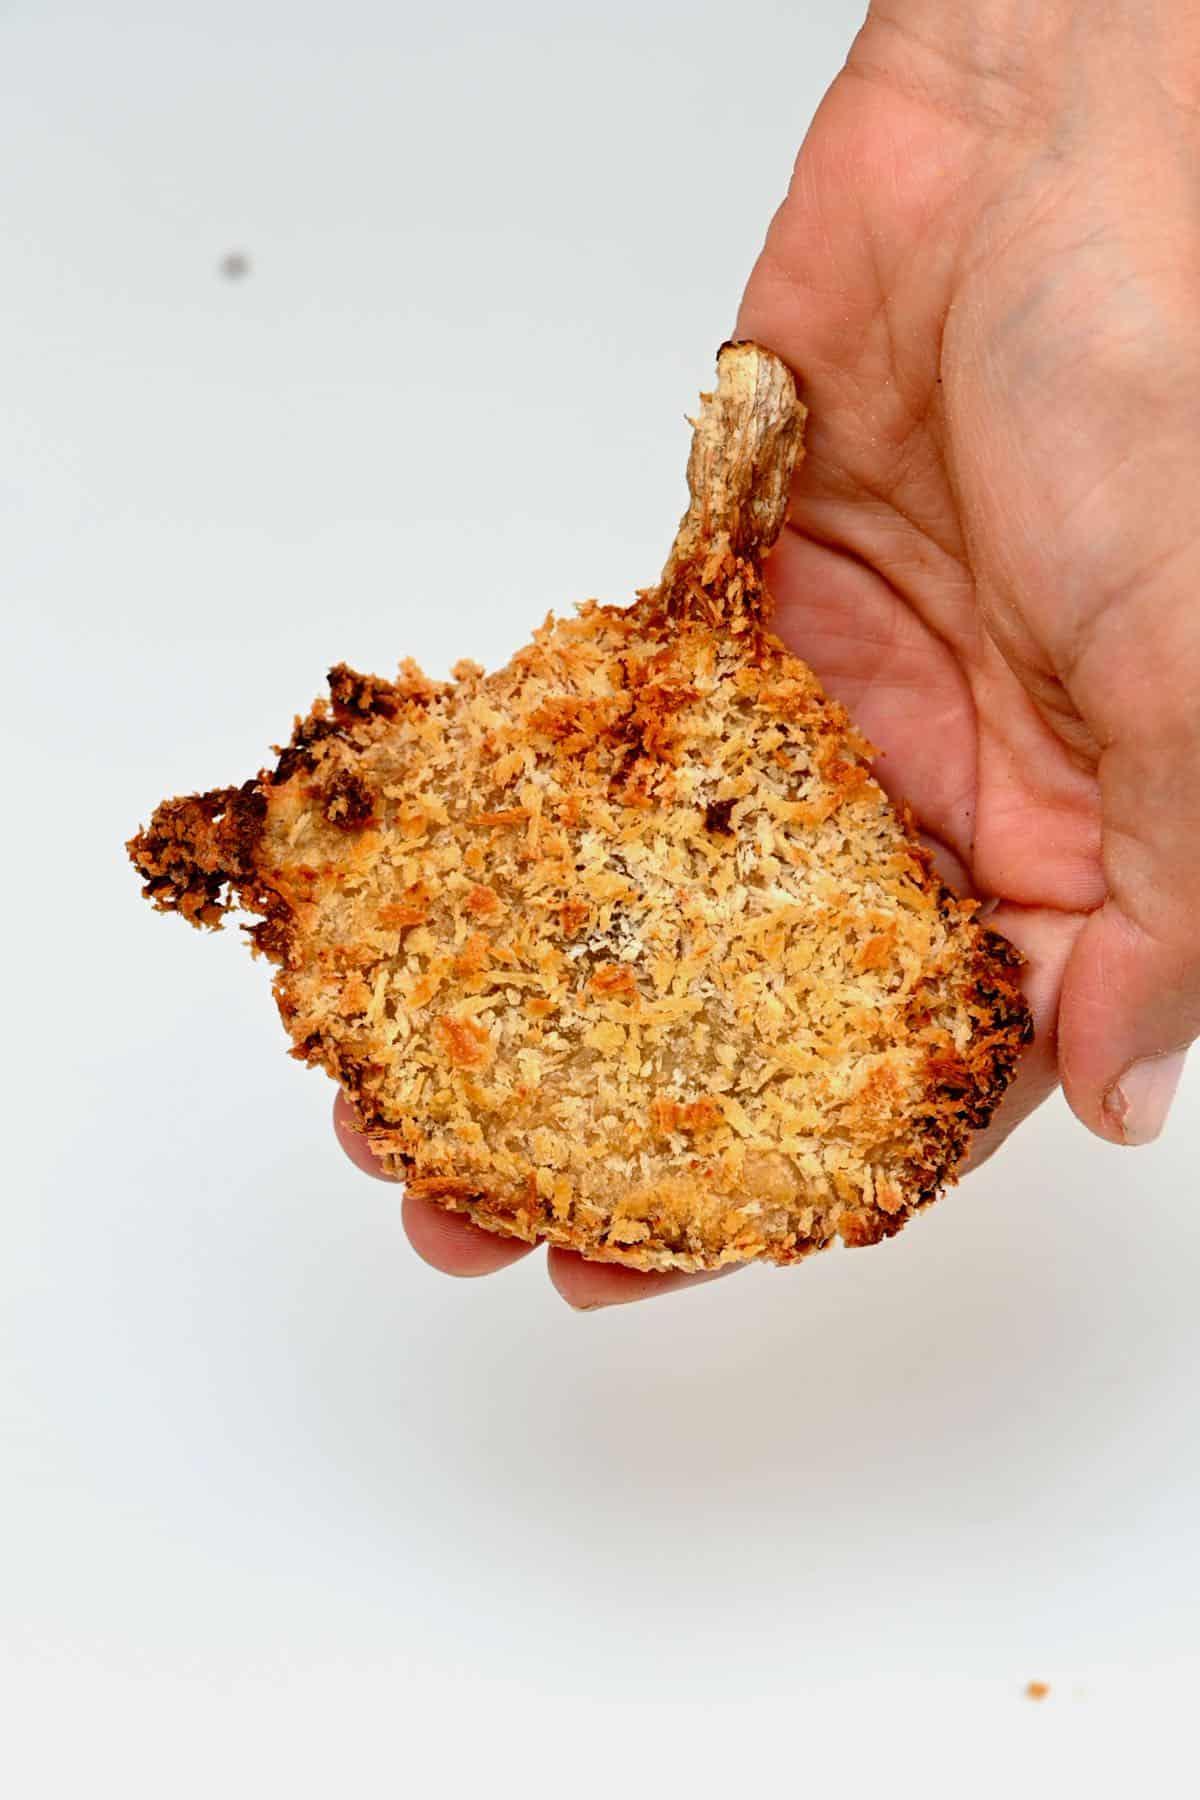 Crispy oyster mushroom in a hand